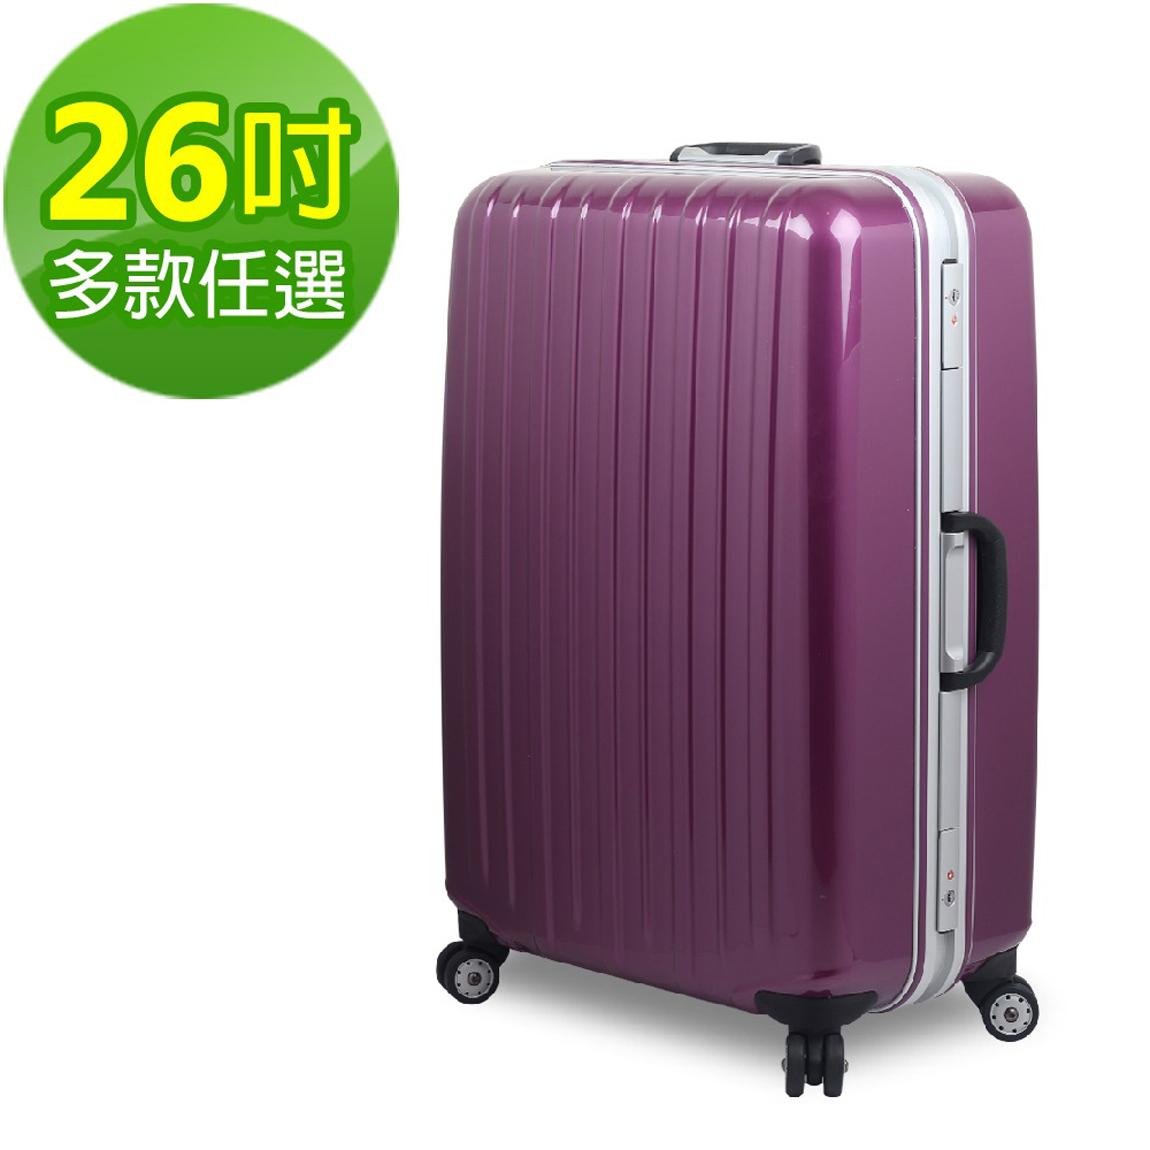 【Travelhouse】COLORS 26吋視覺享宴PC鋁框硬殼行李箱(多色任選)